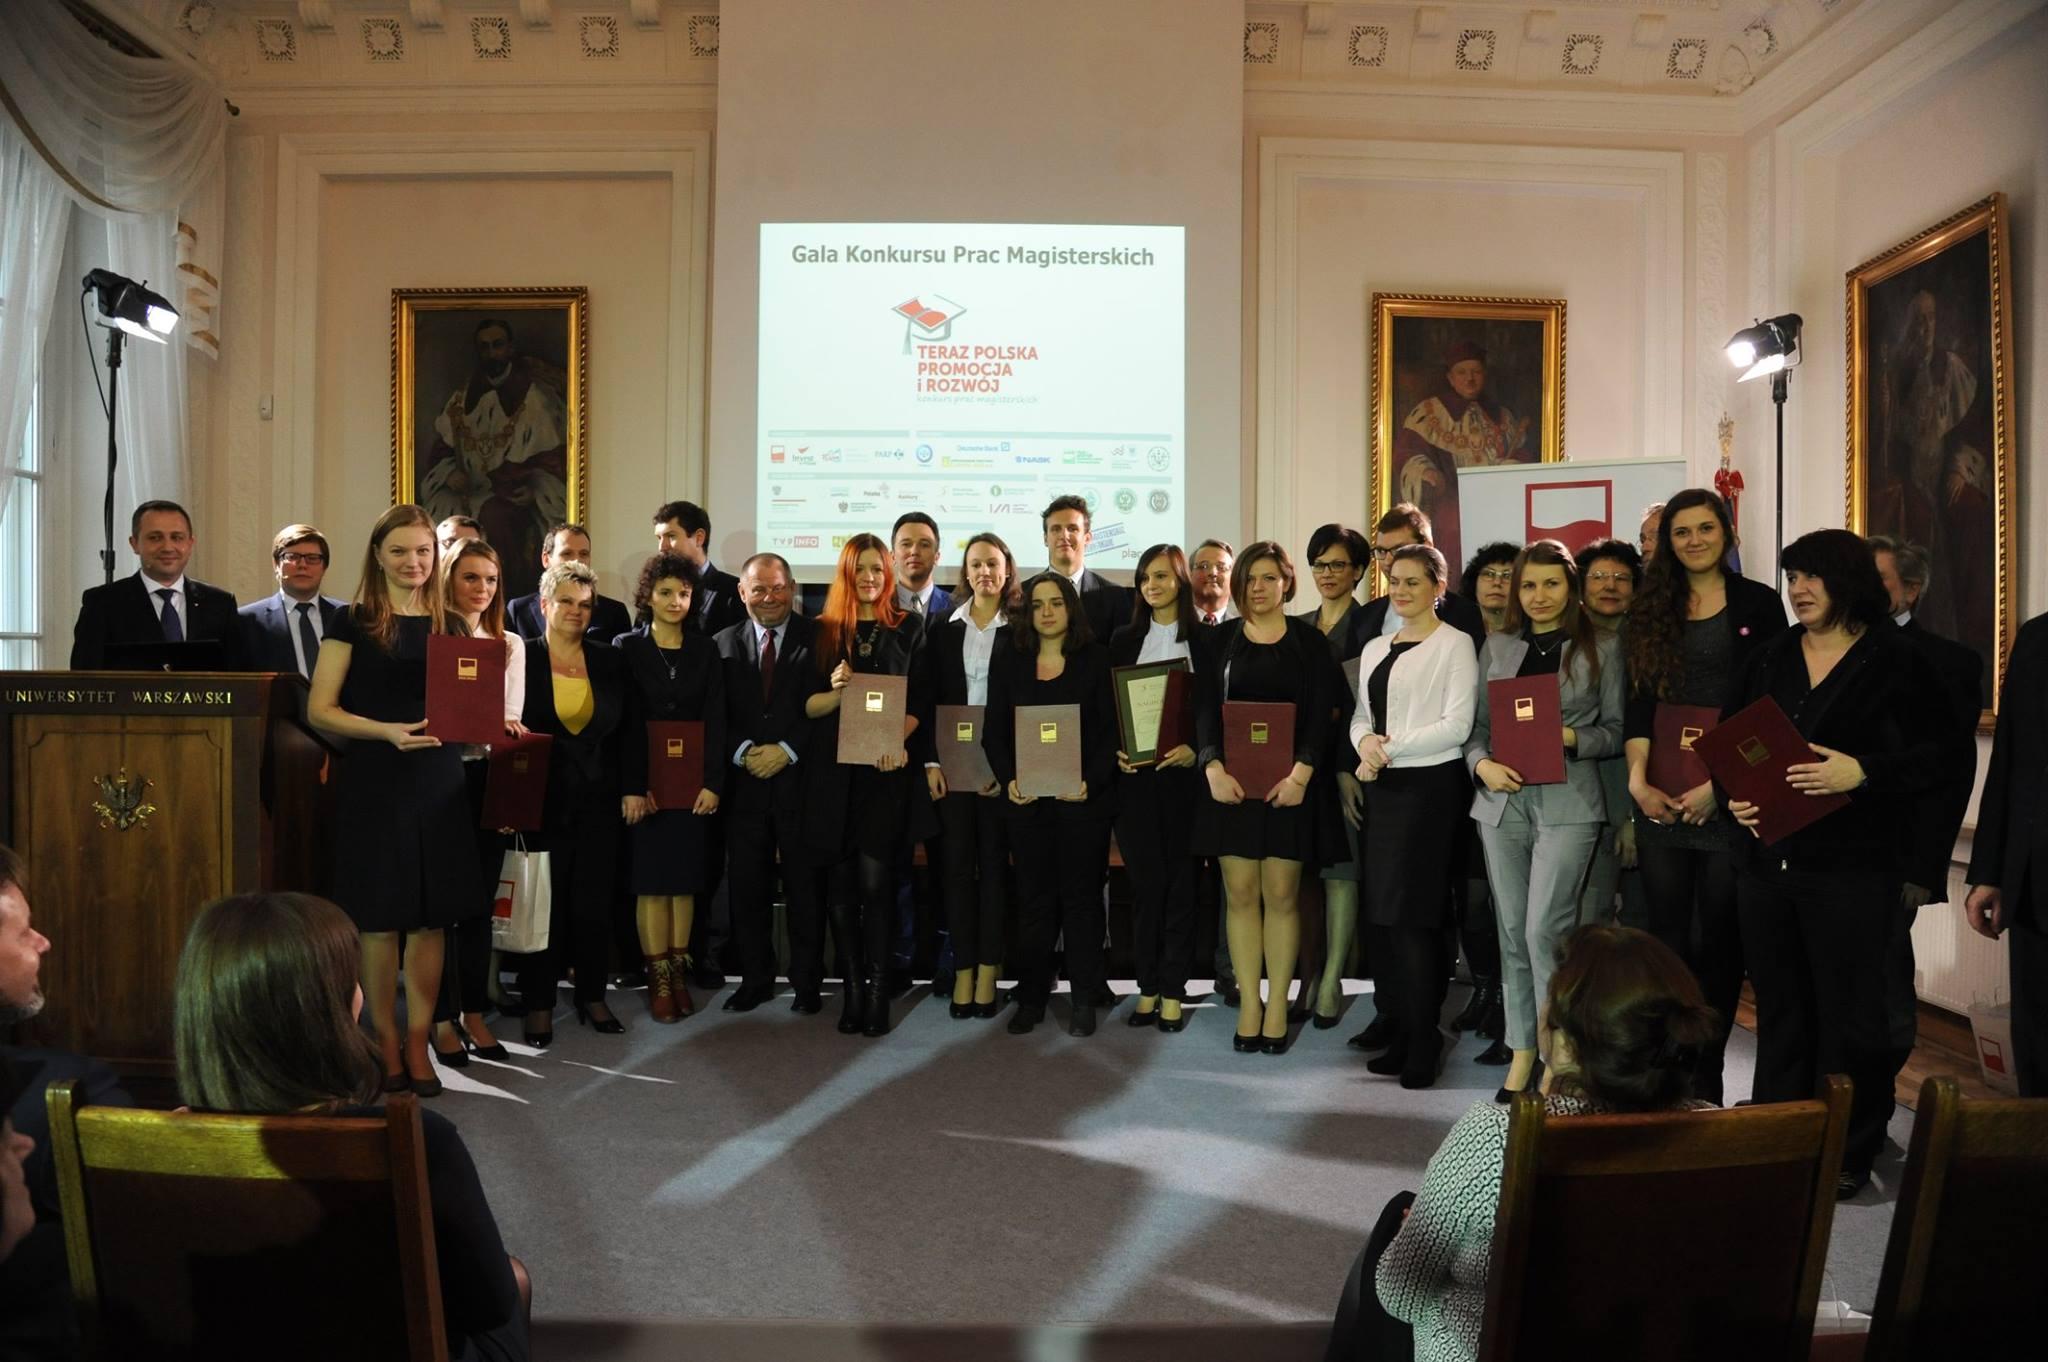 Gala Konkursu Prac Magisterskich